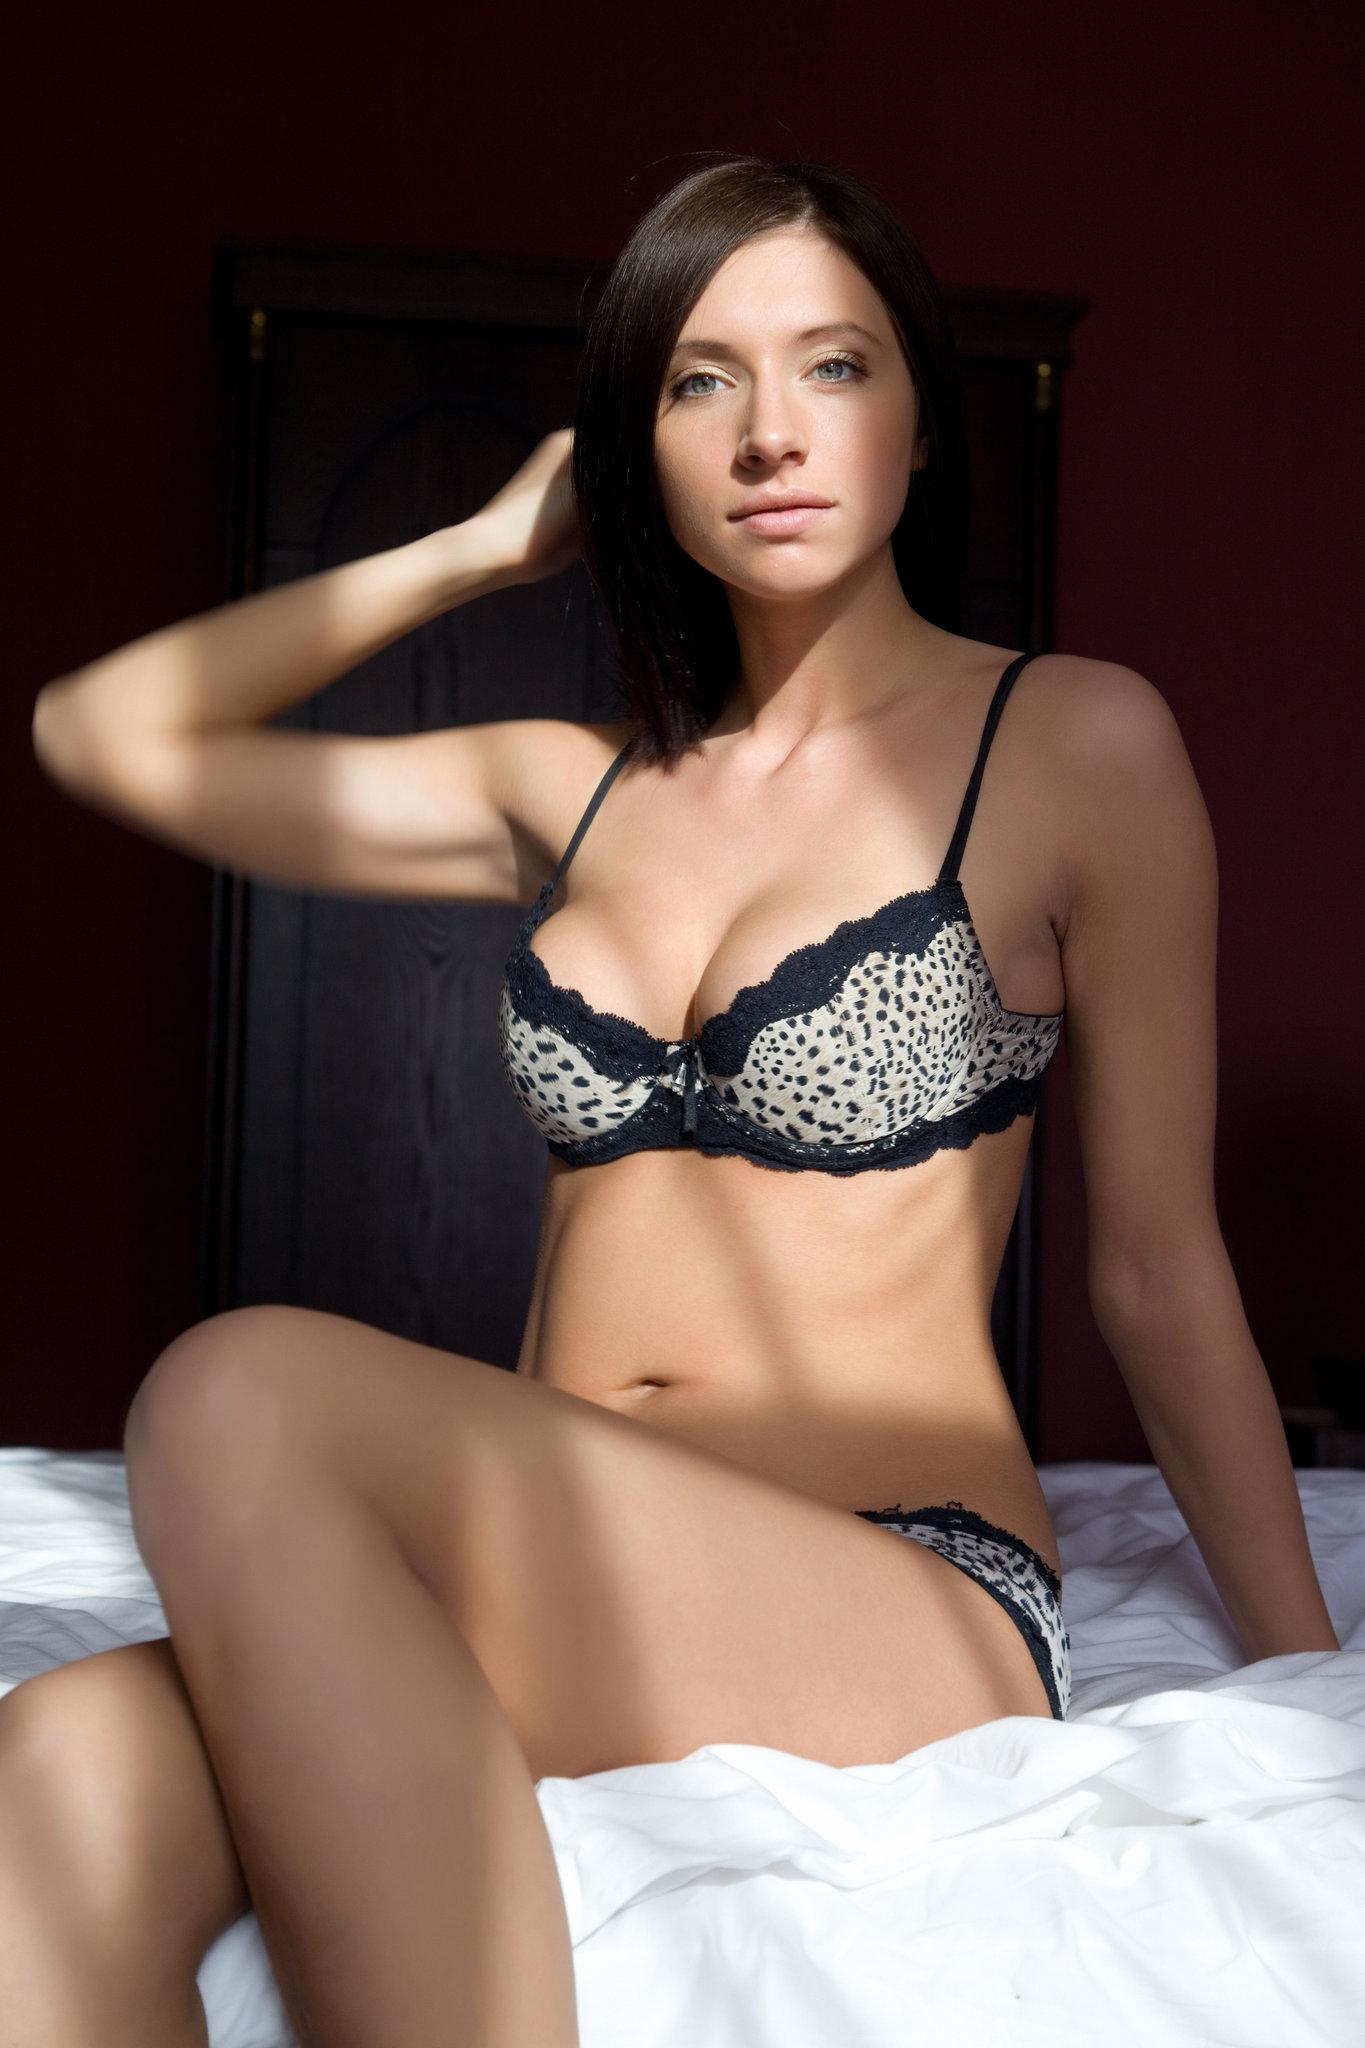 simone-b-lingerie-bed-nude-metart-02